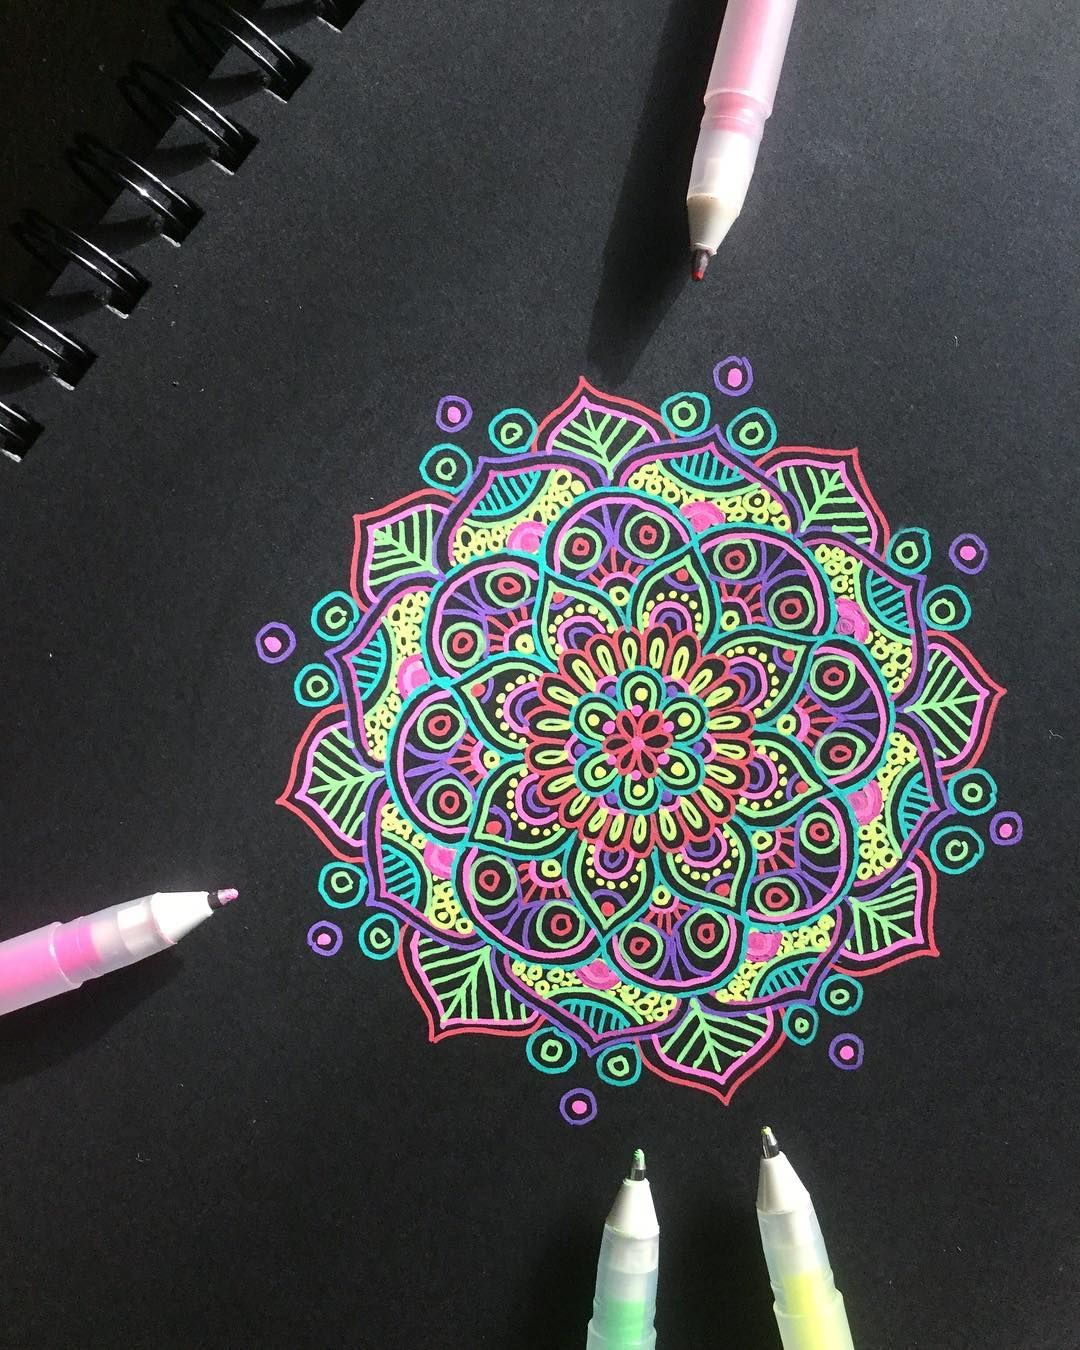 Pin On White On Black Zentangle Mandala Doodling Chernoe Na Belom Zentangl Dudling Mandaly